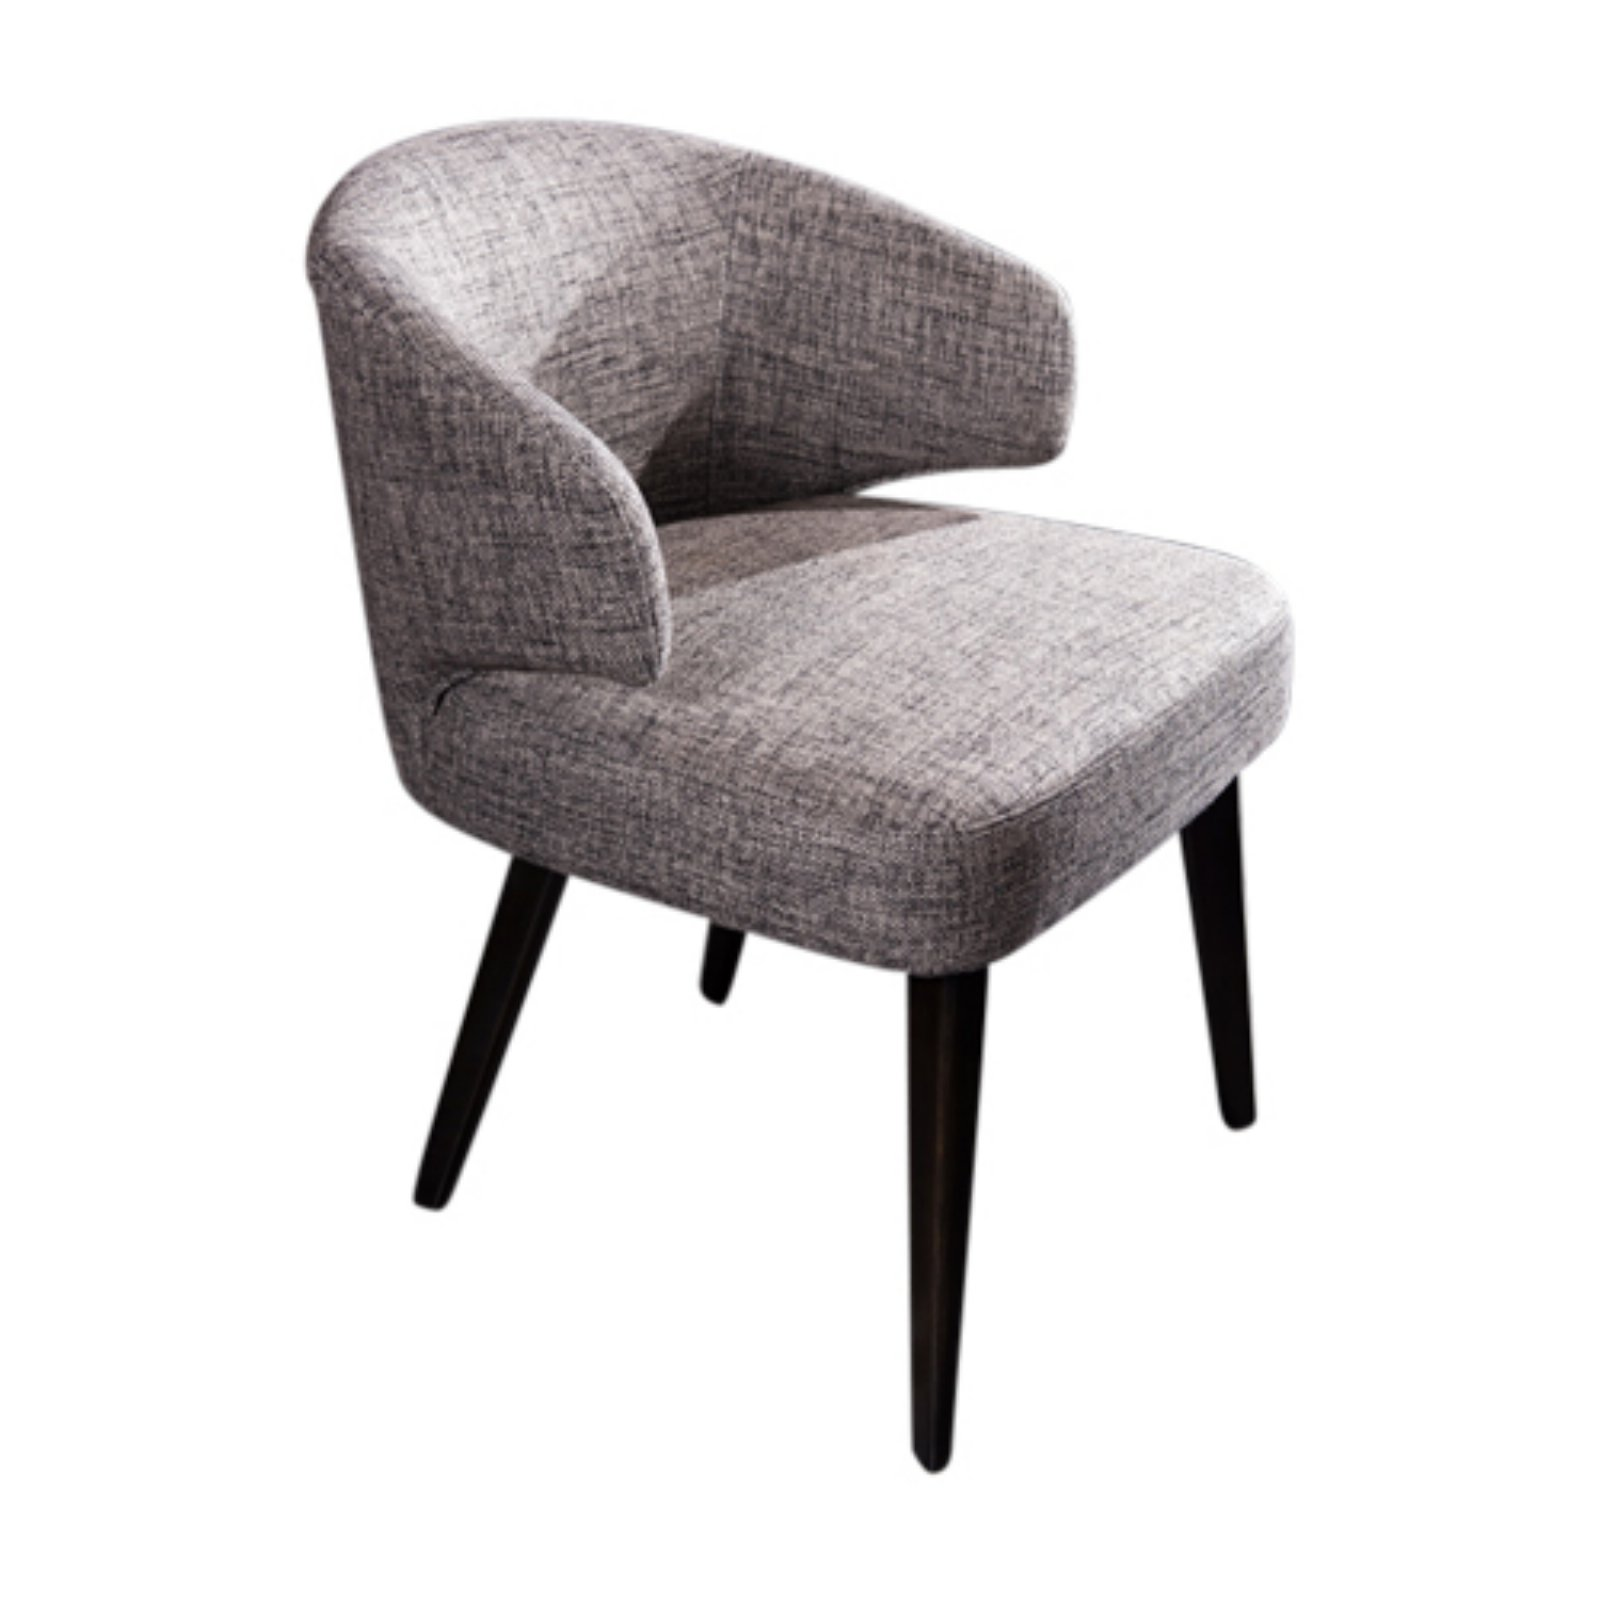 Surprising Vig Furniture Modrest Carlton Dining Chair Walmart Com Bralicious Painted Fabric Chair Ideas Braliciousco